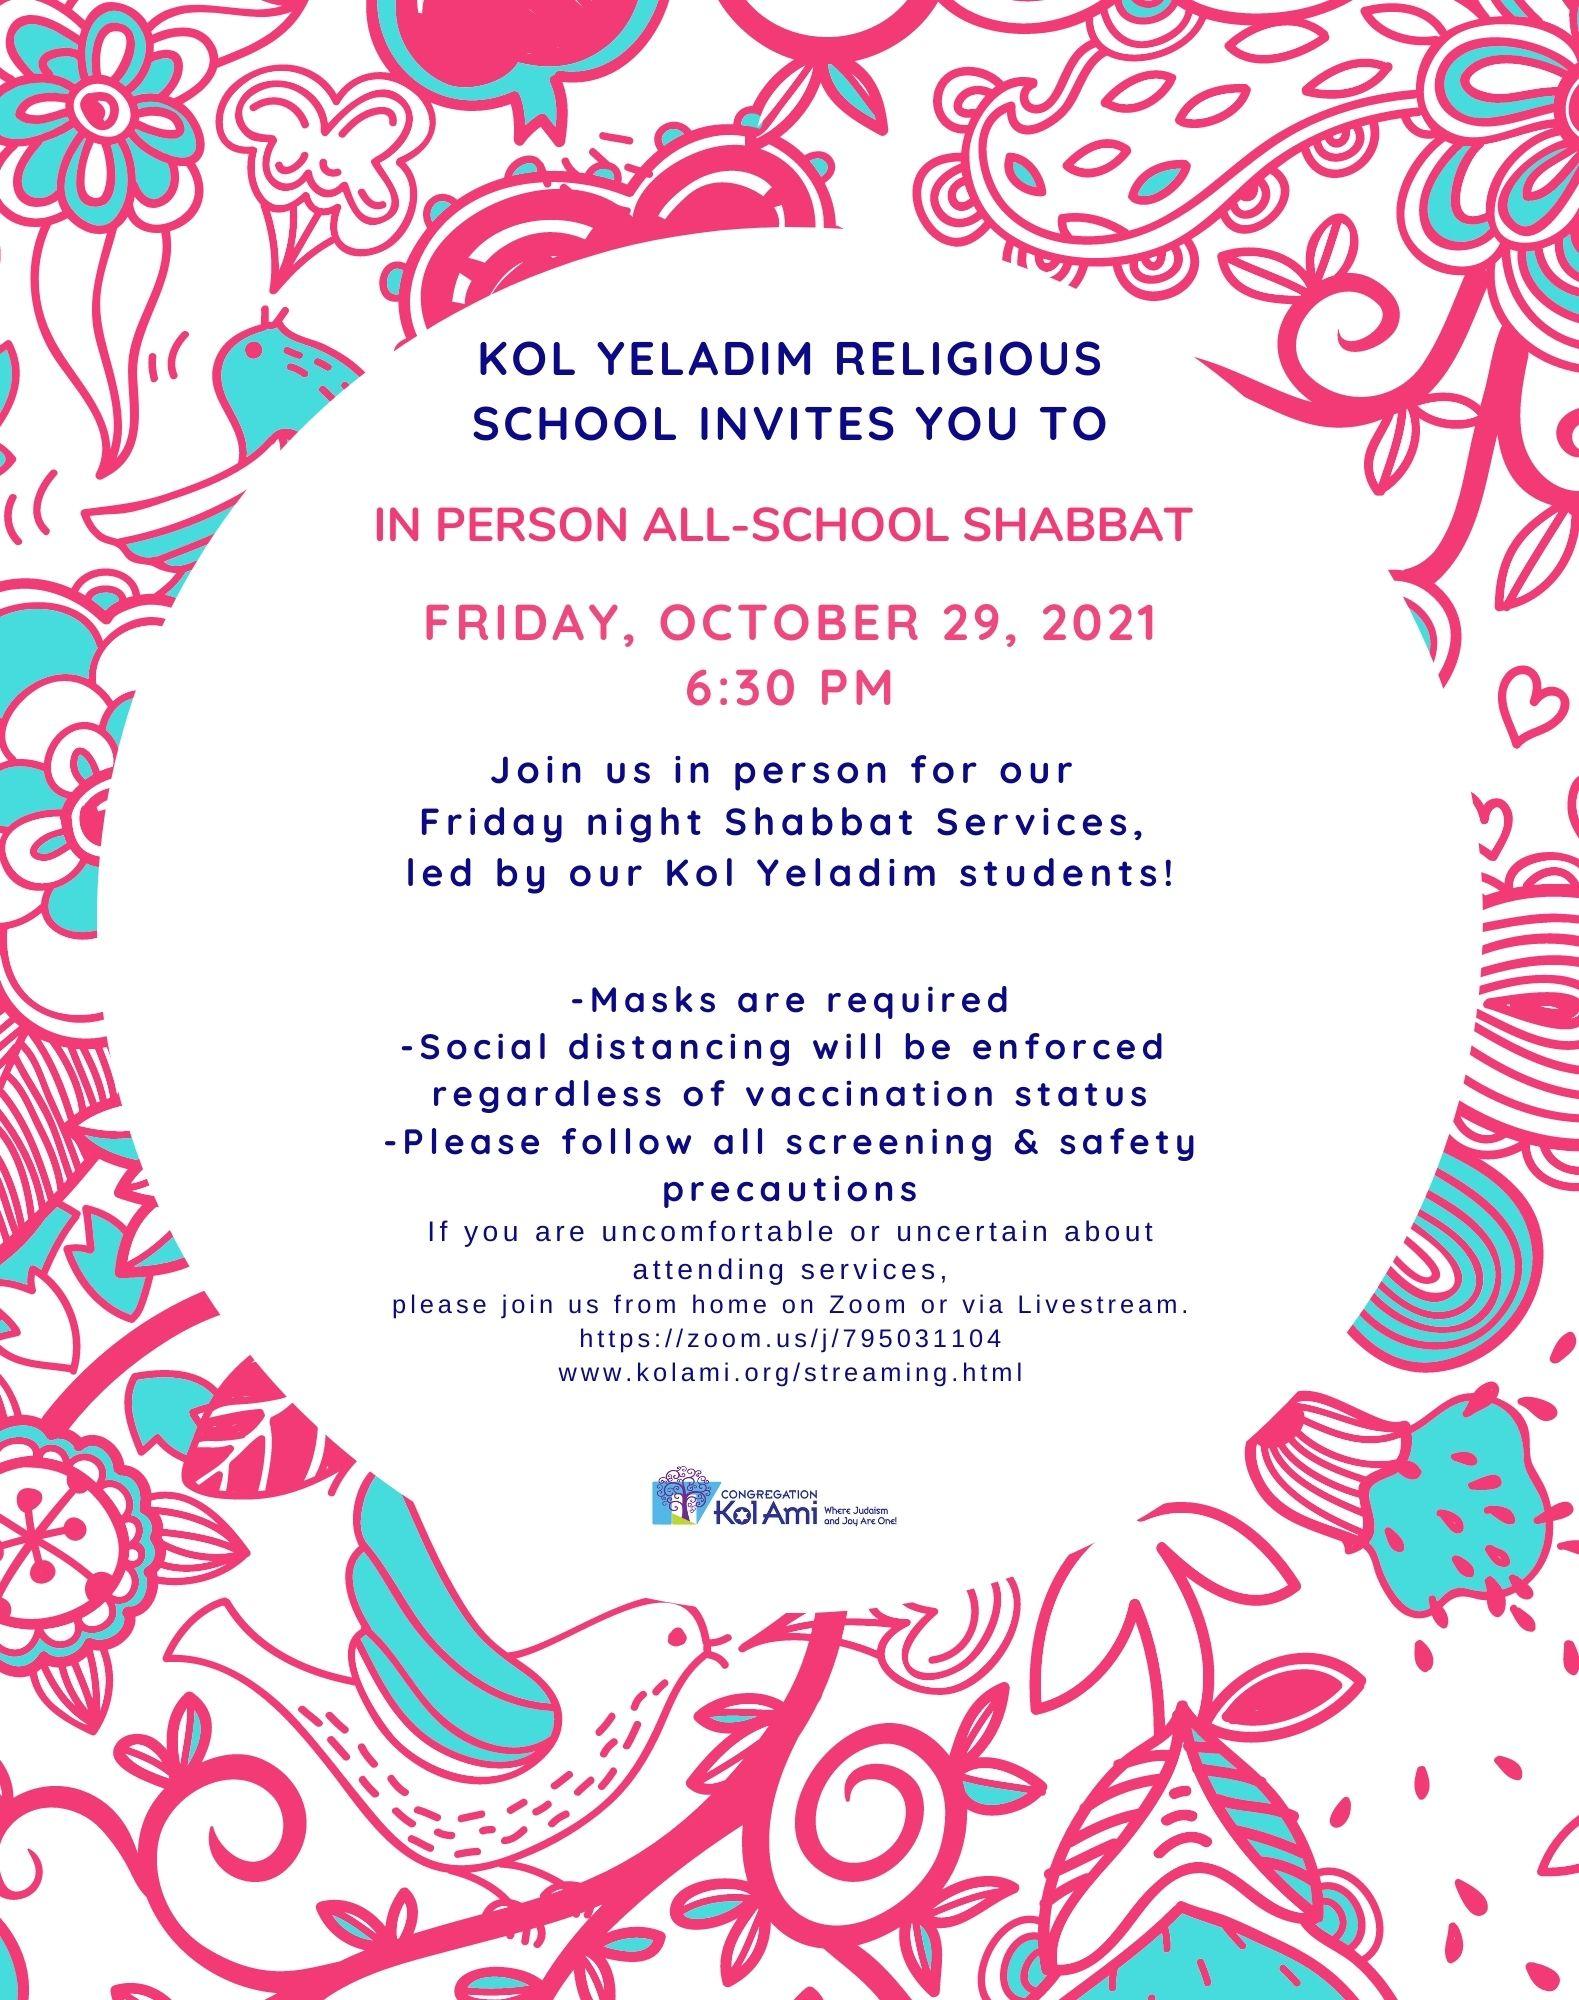 Banner Image for In- Person & Virtual : All Kol Yeladim School Shabbat Services